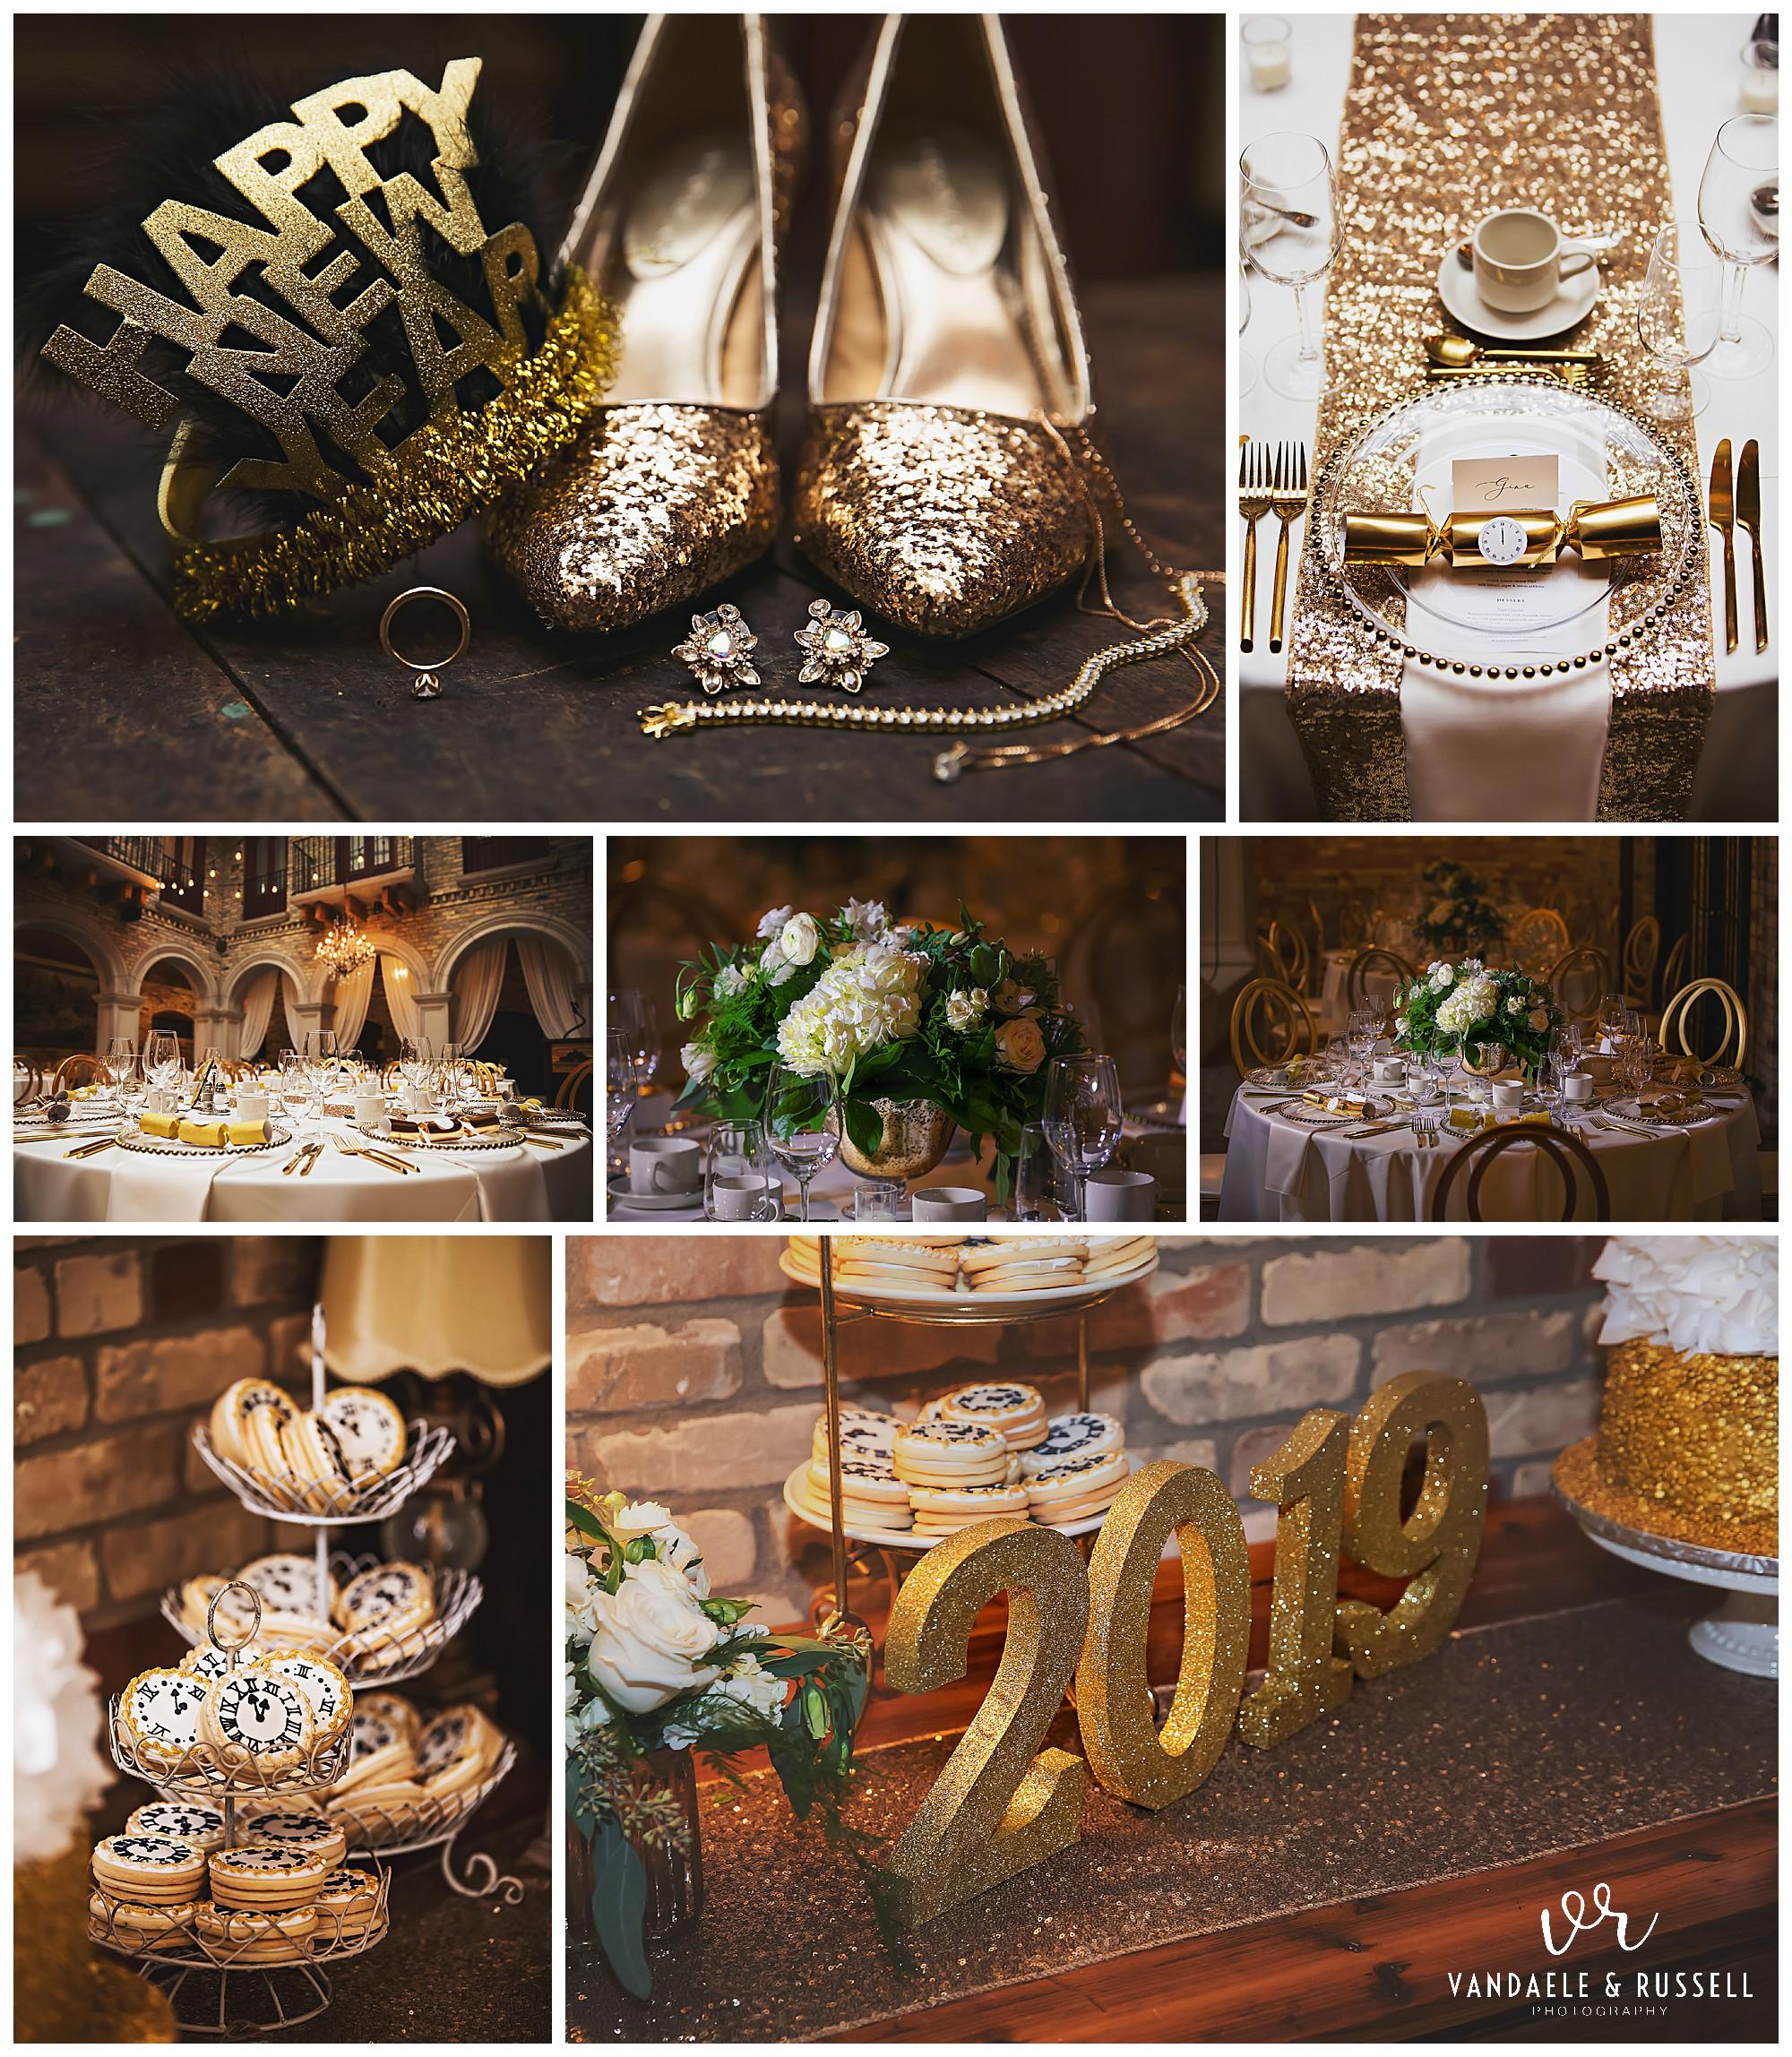 Hacienda-Sarria-Wedding-Photos-NYE-Michelle-Matt-VanDaele-Russell_0002.jpg